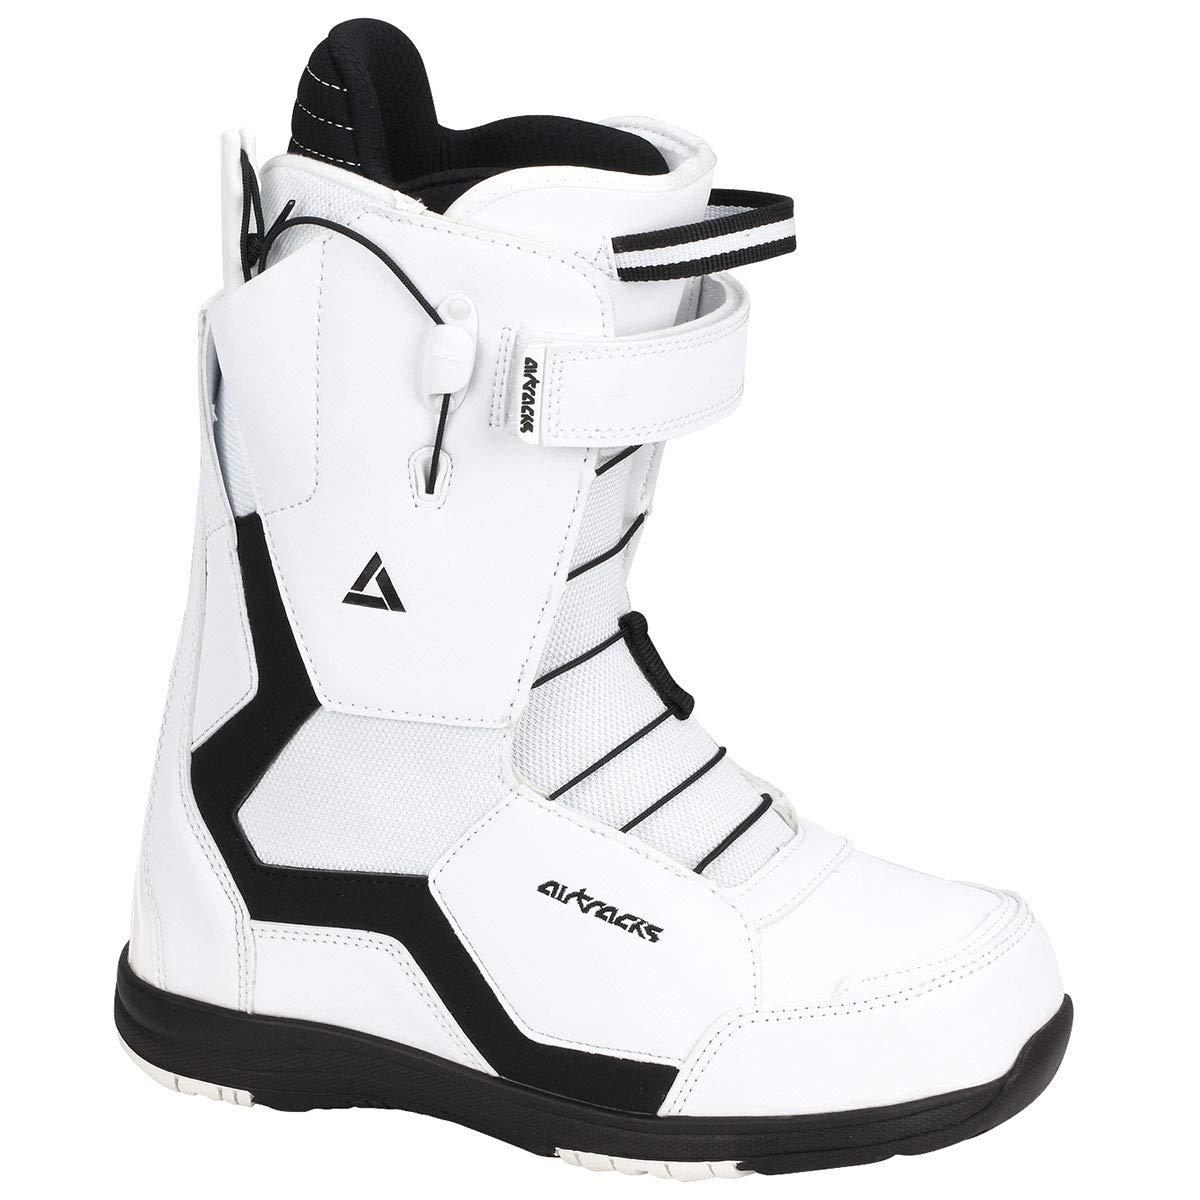 Botas de Snowboard AIRTRACKS Strong Quick Lace//QL